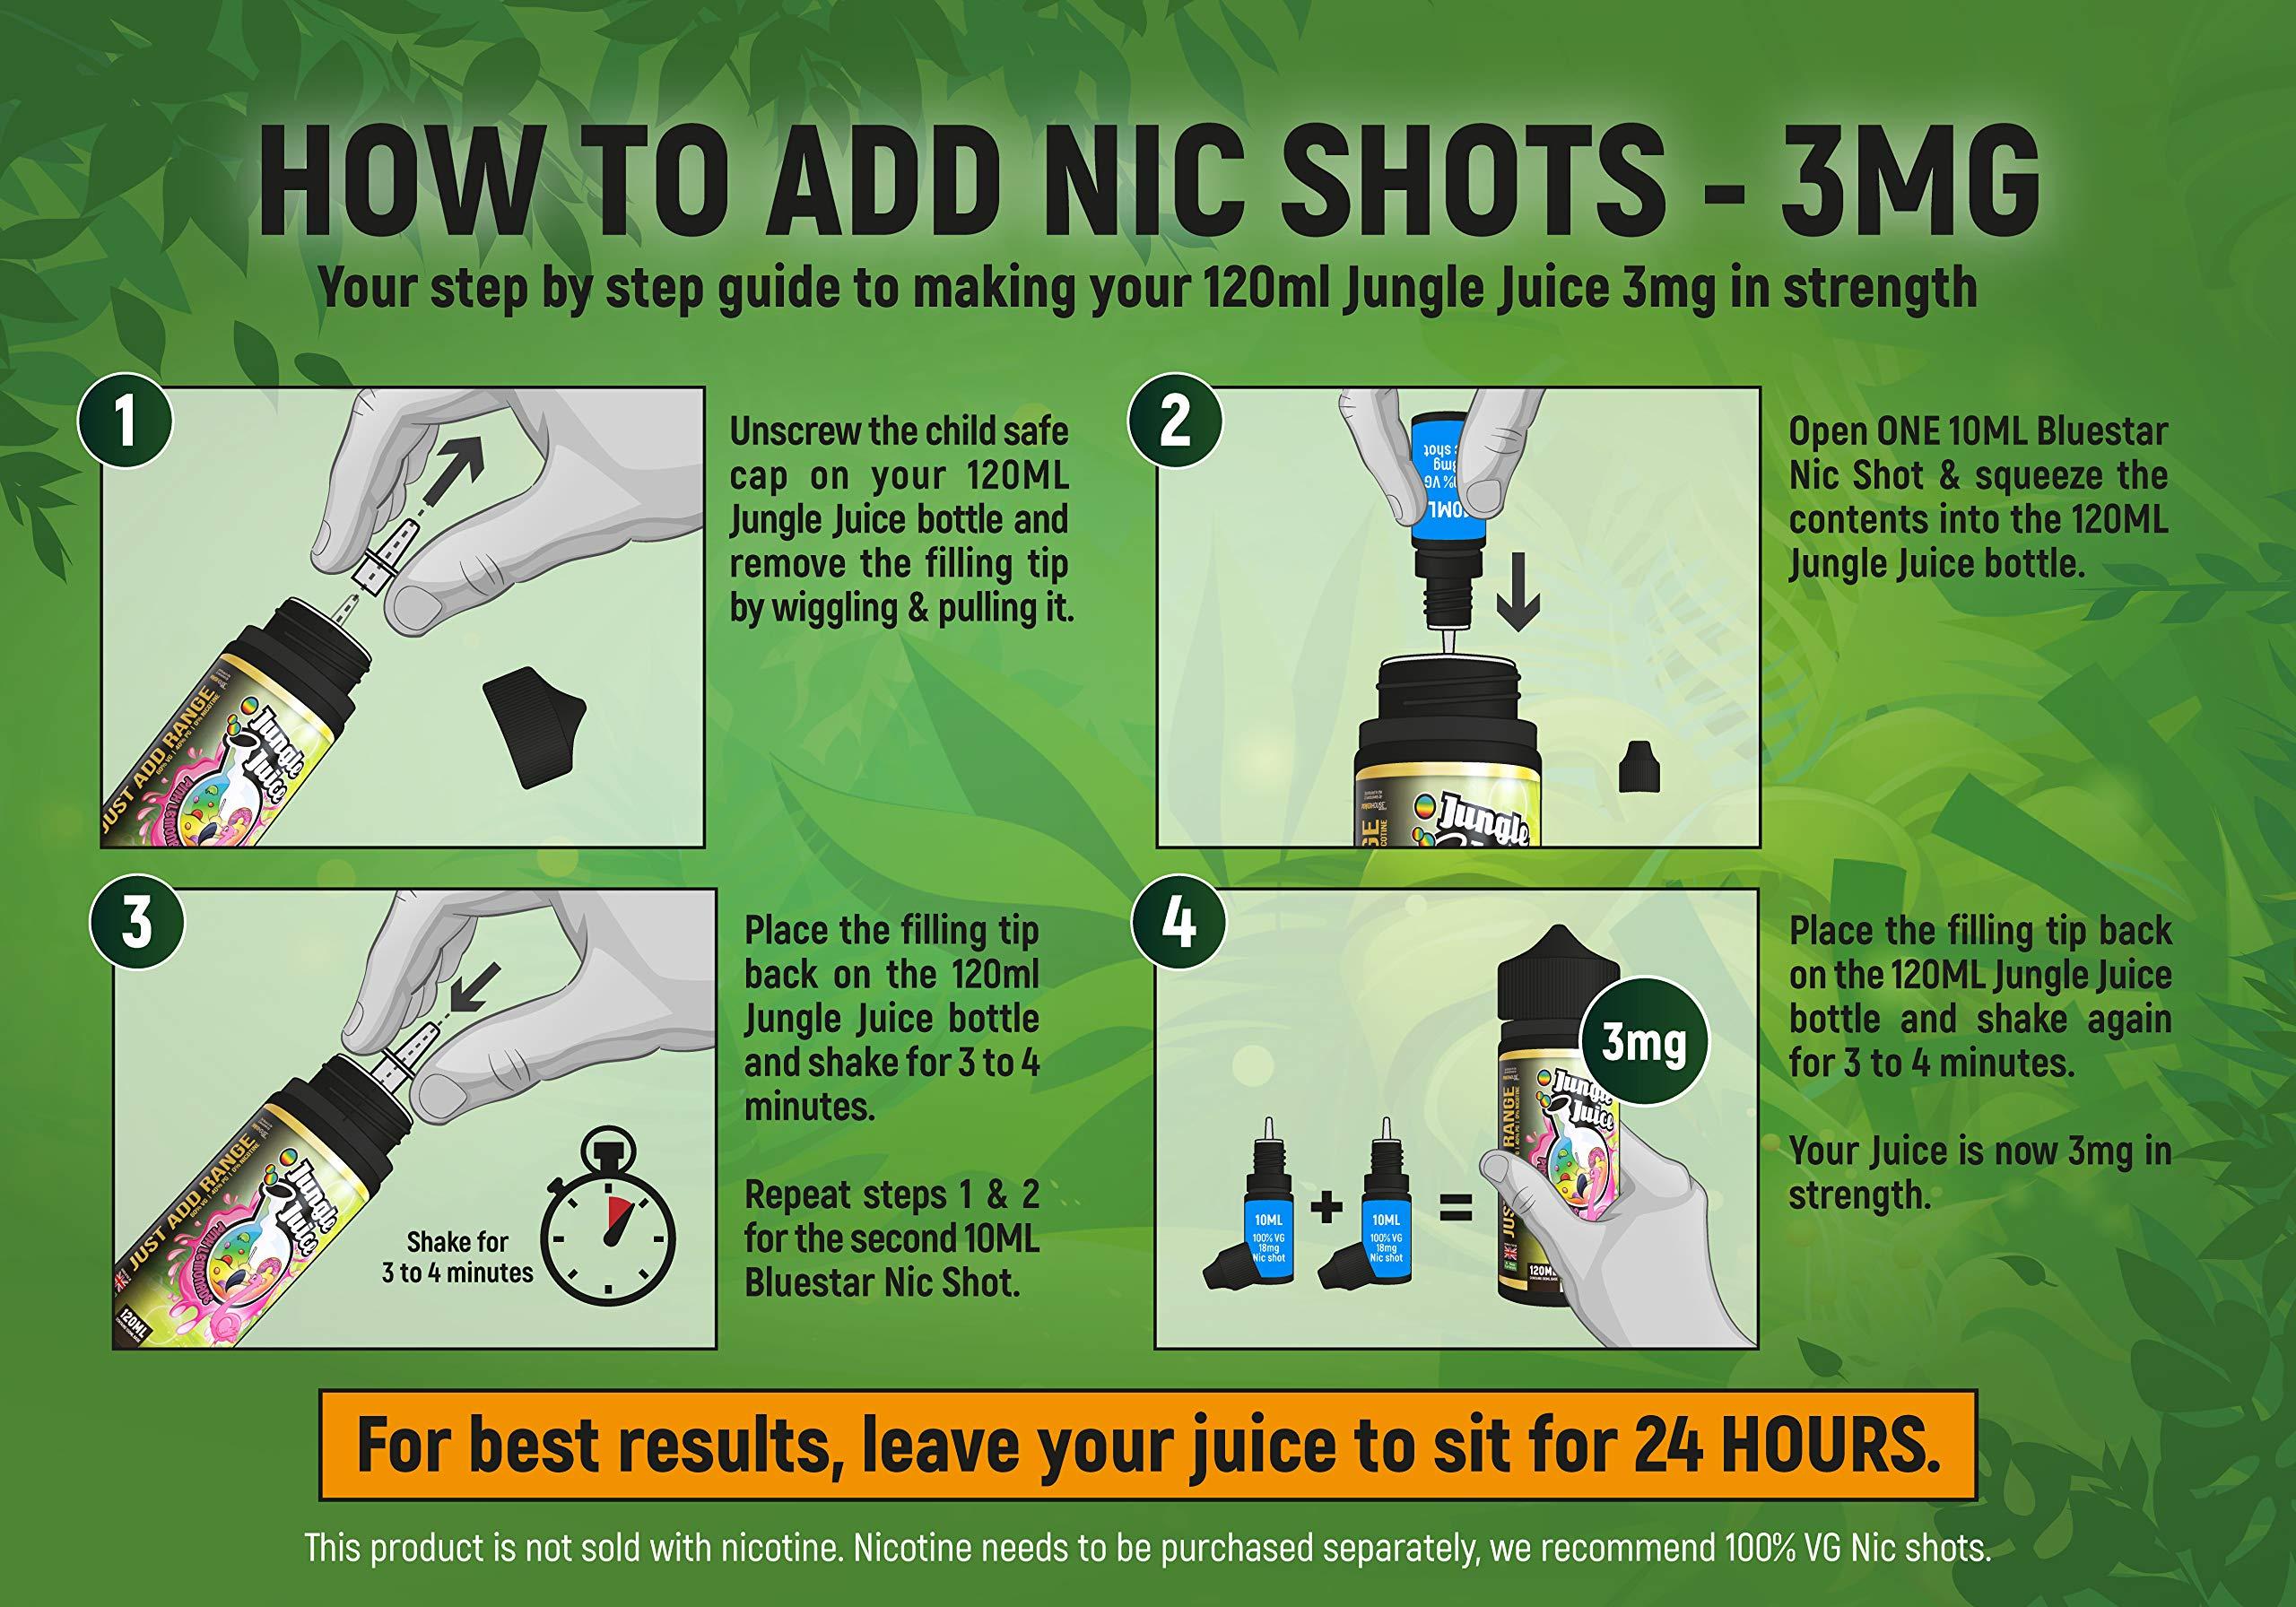 Nicotine Free 0% | 100ml Jungle Juice Premium Vape Liquid Bumper Pack | E Liquid & 30ml Needle tip Bottle | Double Filtered Base for Velvet Celestial Vape Juice | Various Flavours Available 4